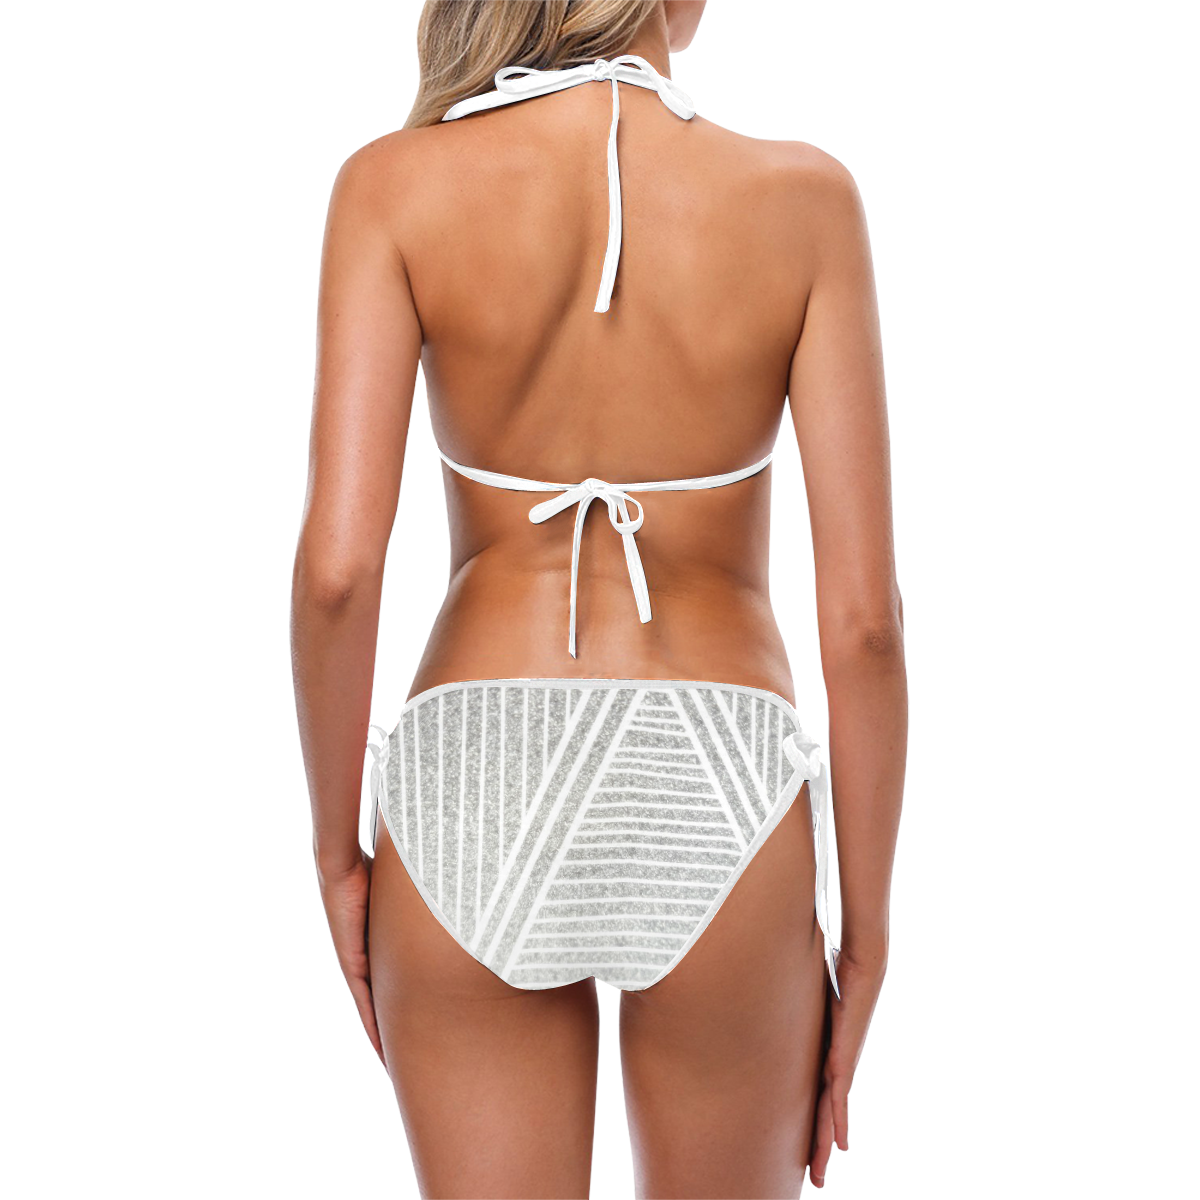 Silverline Custom Bikini Swimsuit (Model S01)